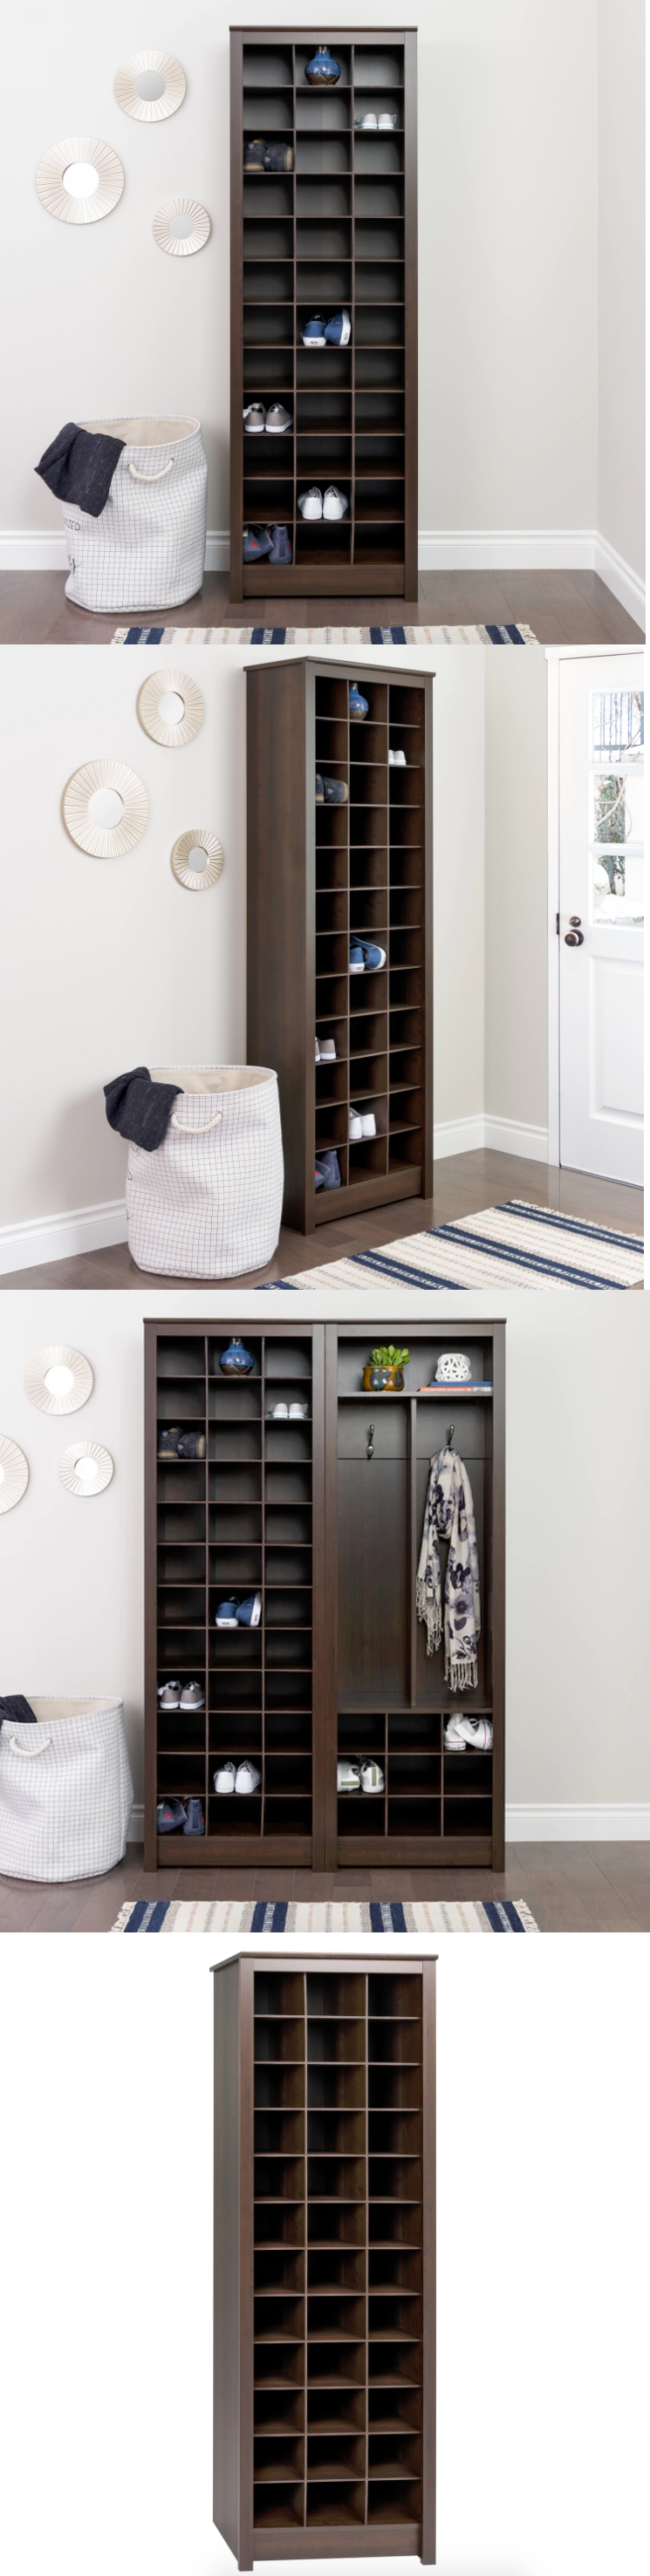 Hallway storage shoes  Shoe Organizers  Cubby Cabinet Shoe Storage Organizer For